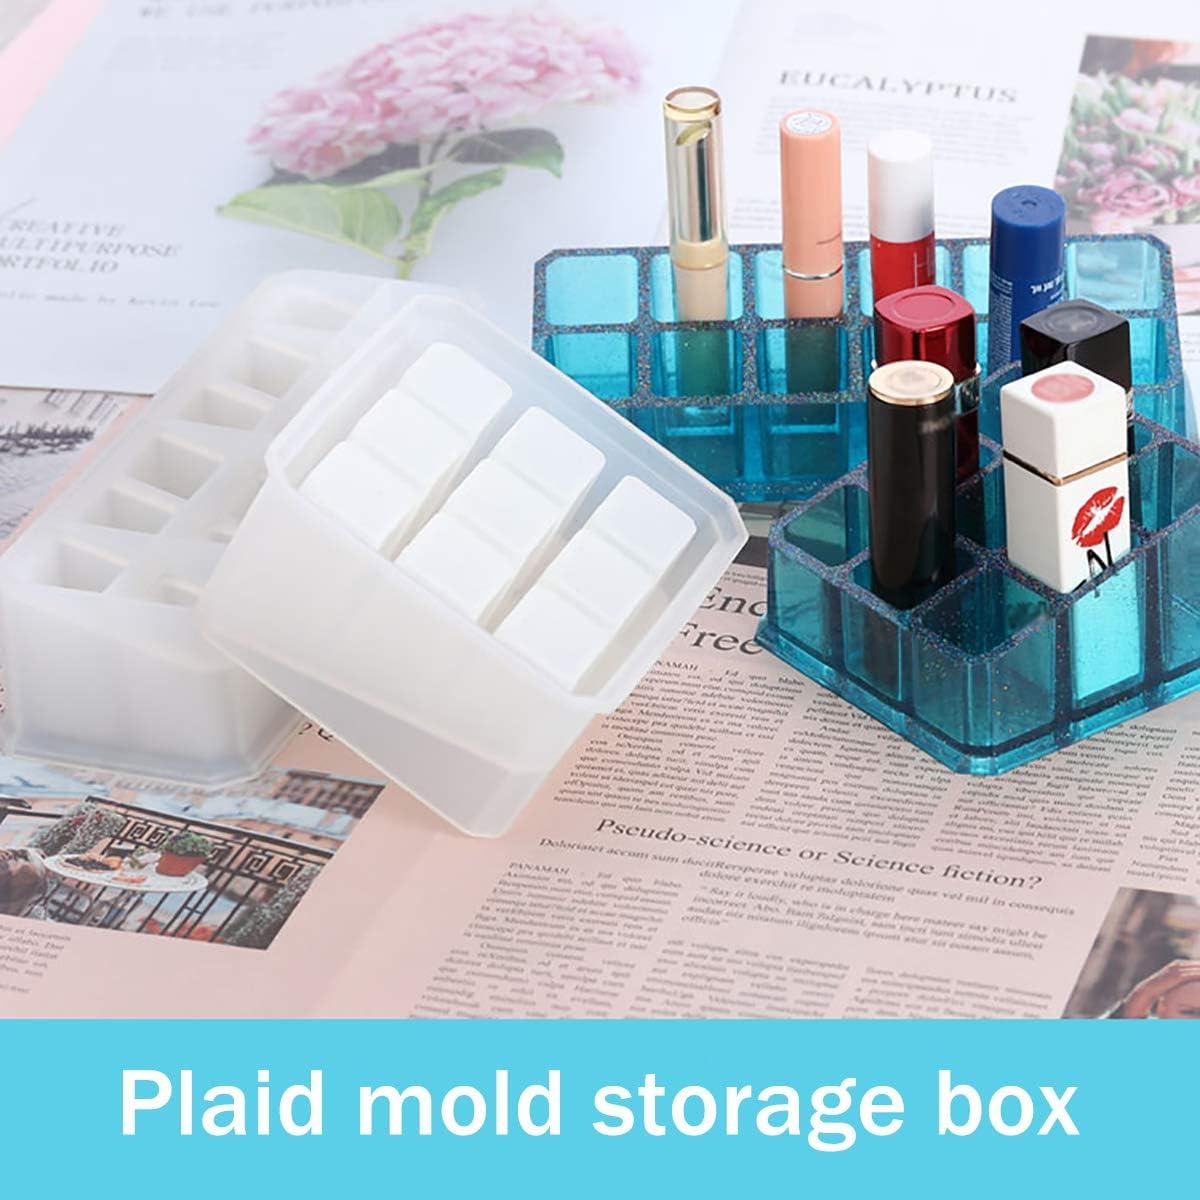 Hexagon Mold iSuperb Silicone Resin Mold Jewelry Storage Box Mold Hexagon Epoxy Mold for Making Trinket Box DIY Craft Decoration